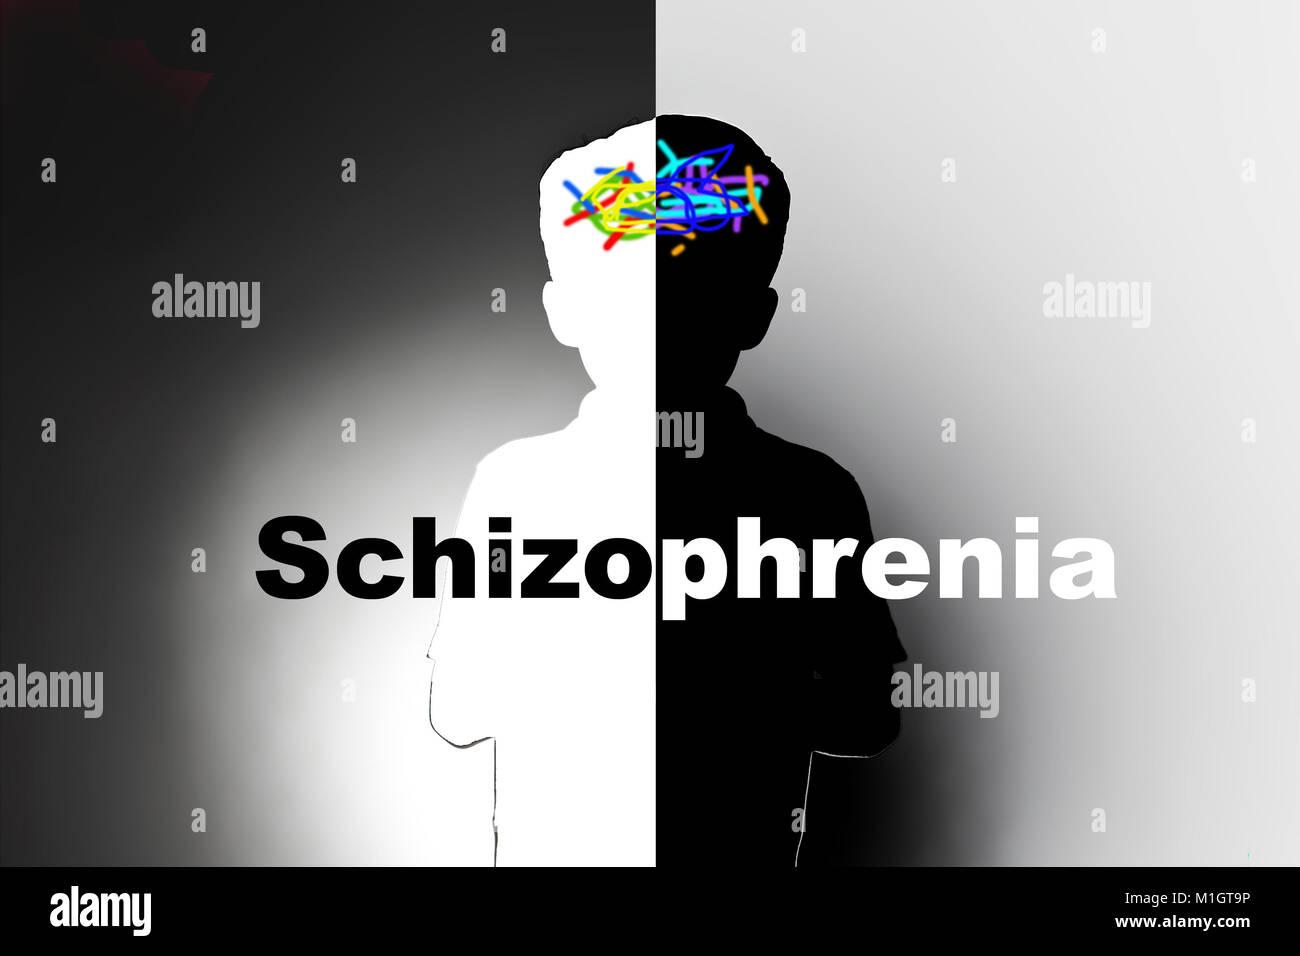 childhood schizophrenia, safeguarding children and social care,mental illness - Stock Image